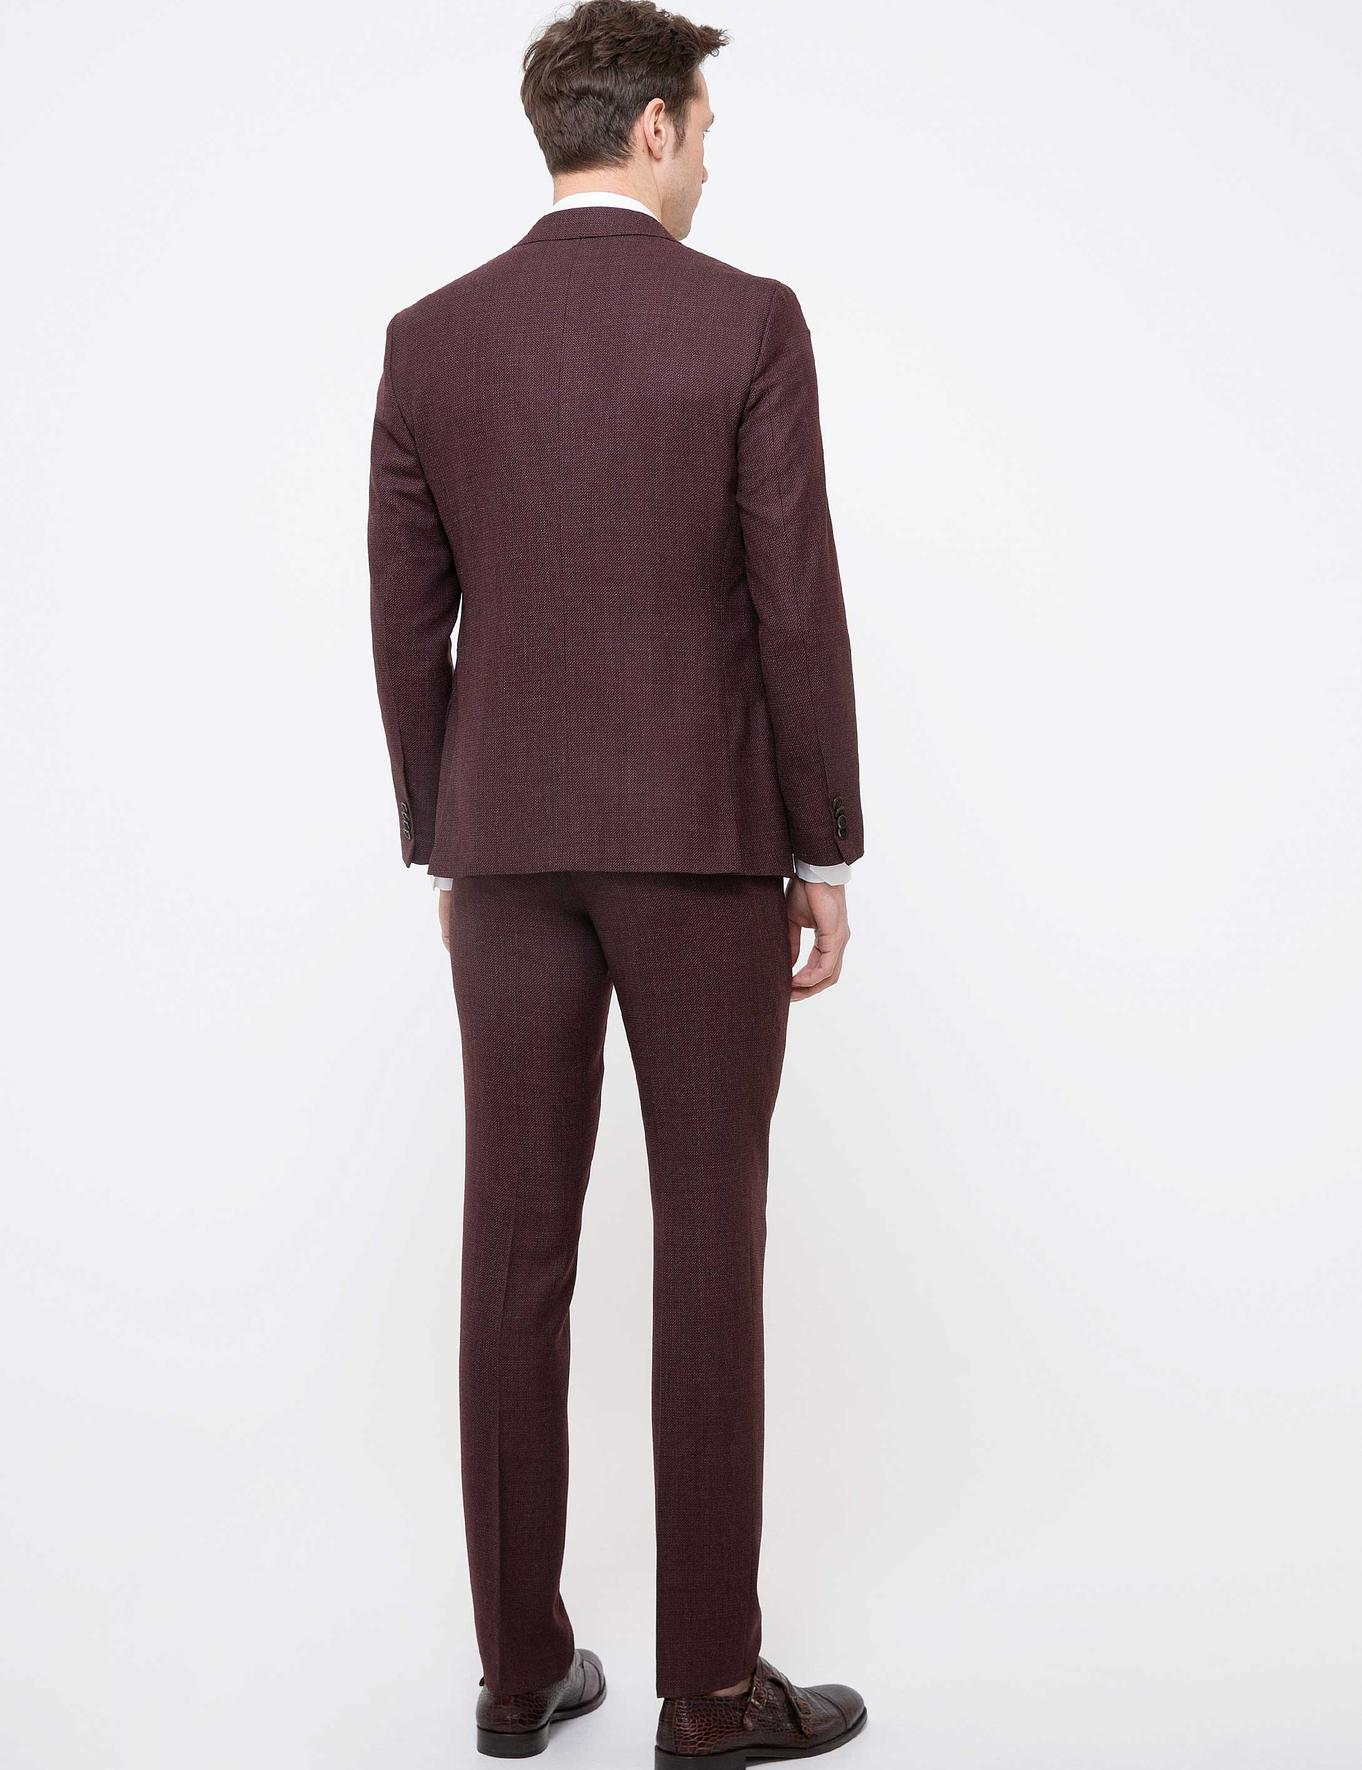 Bordo Slim Fit Takım Elbise - 50200677001